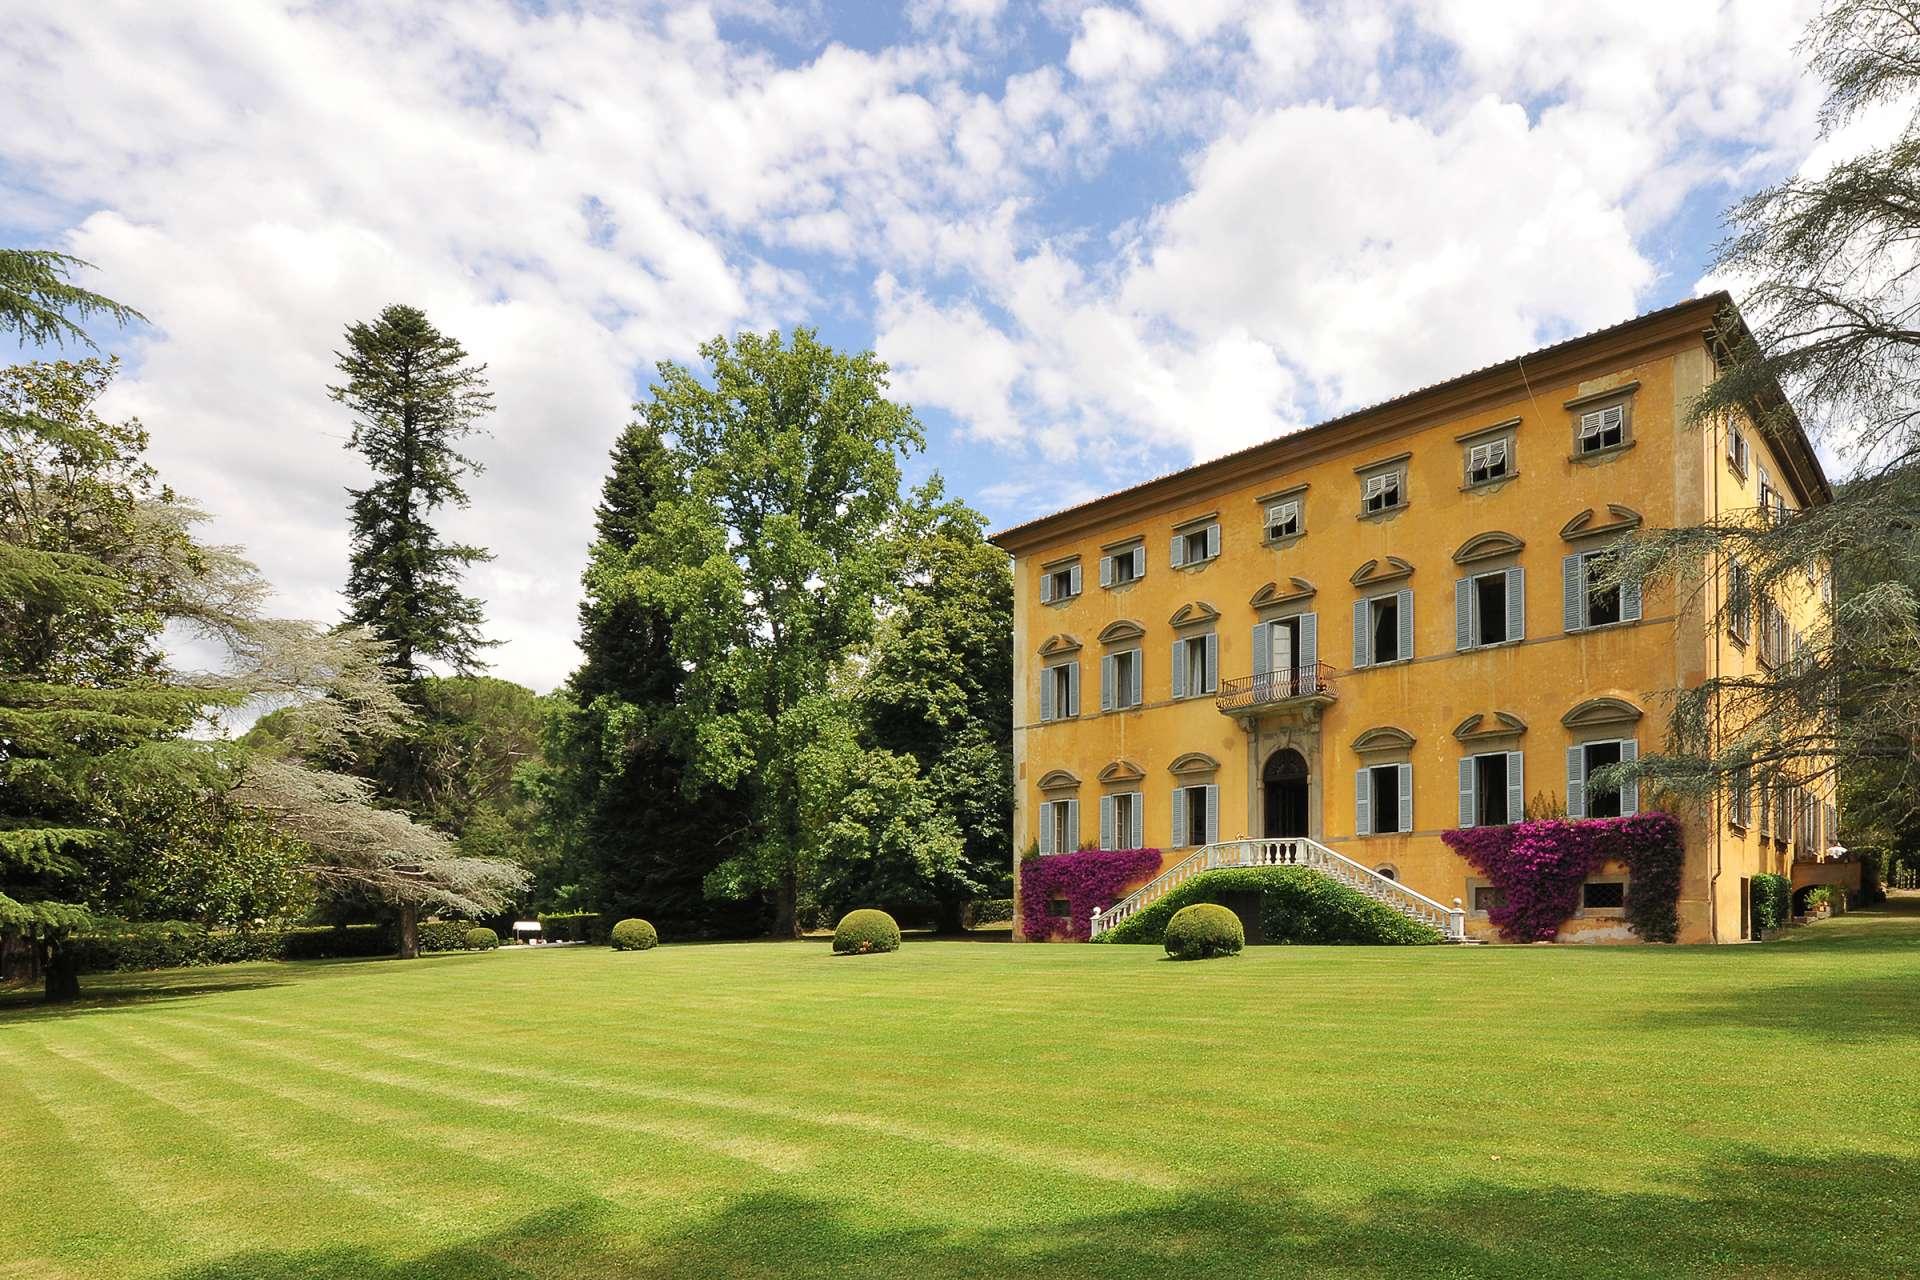 Matrimonio Country Chic Pisa : Villa lungomonte bed luxury villa with pool pisa lucca